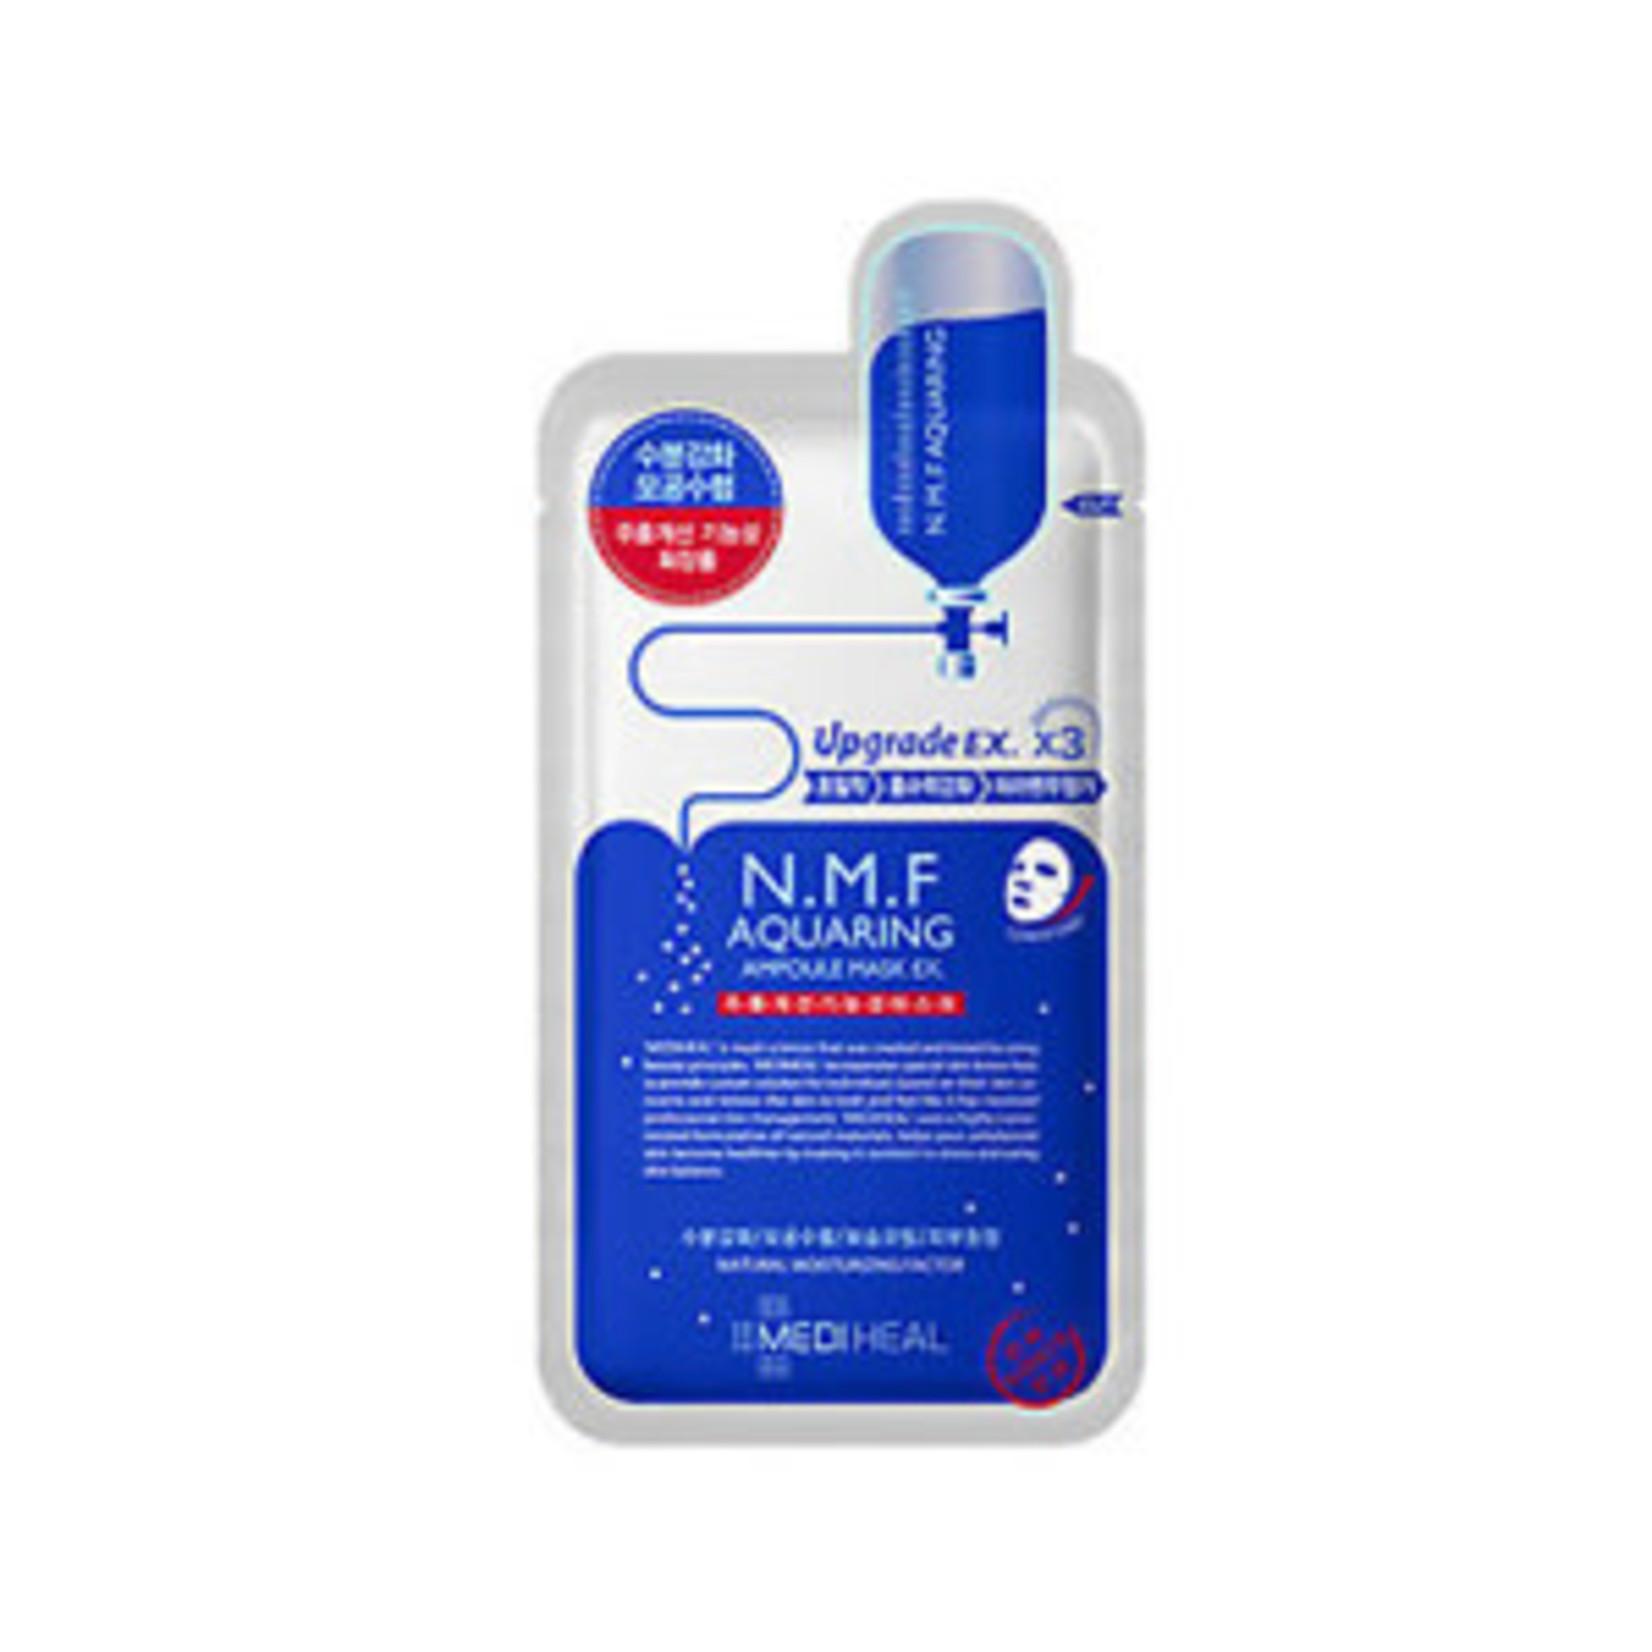 Mediheal Mediheal N.M.F Aquaring Ampoule Mask